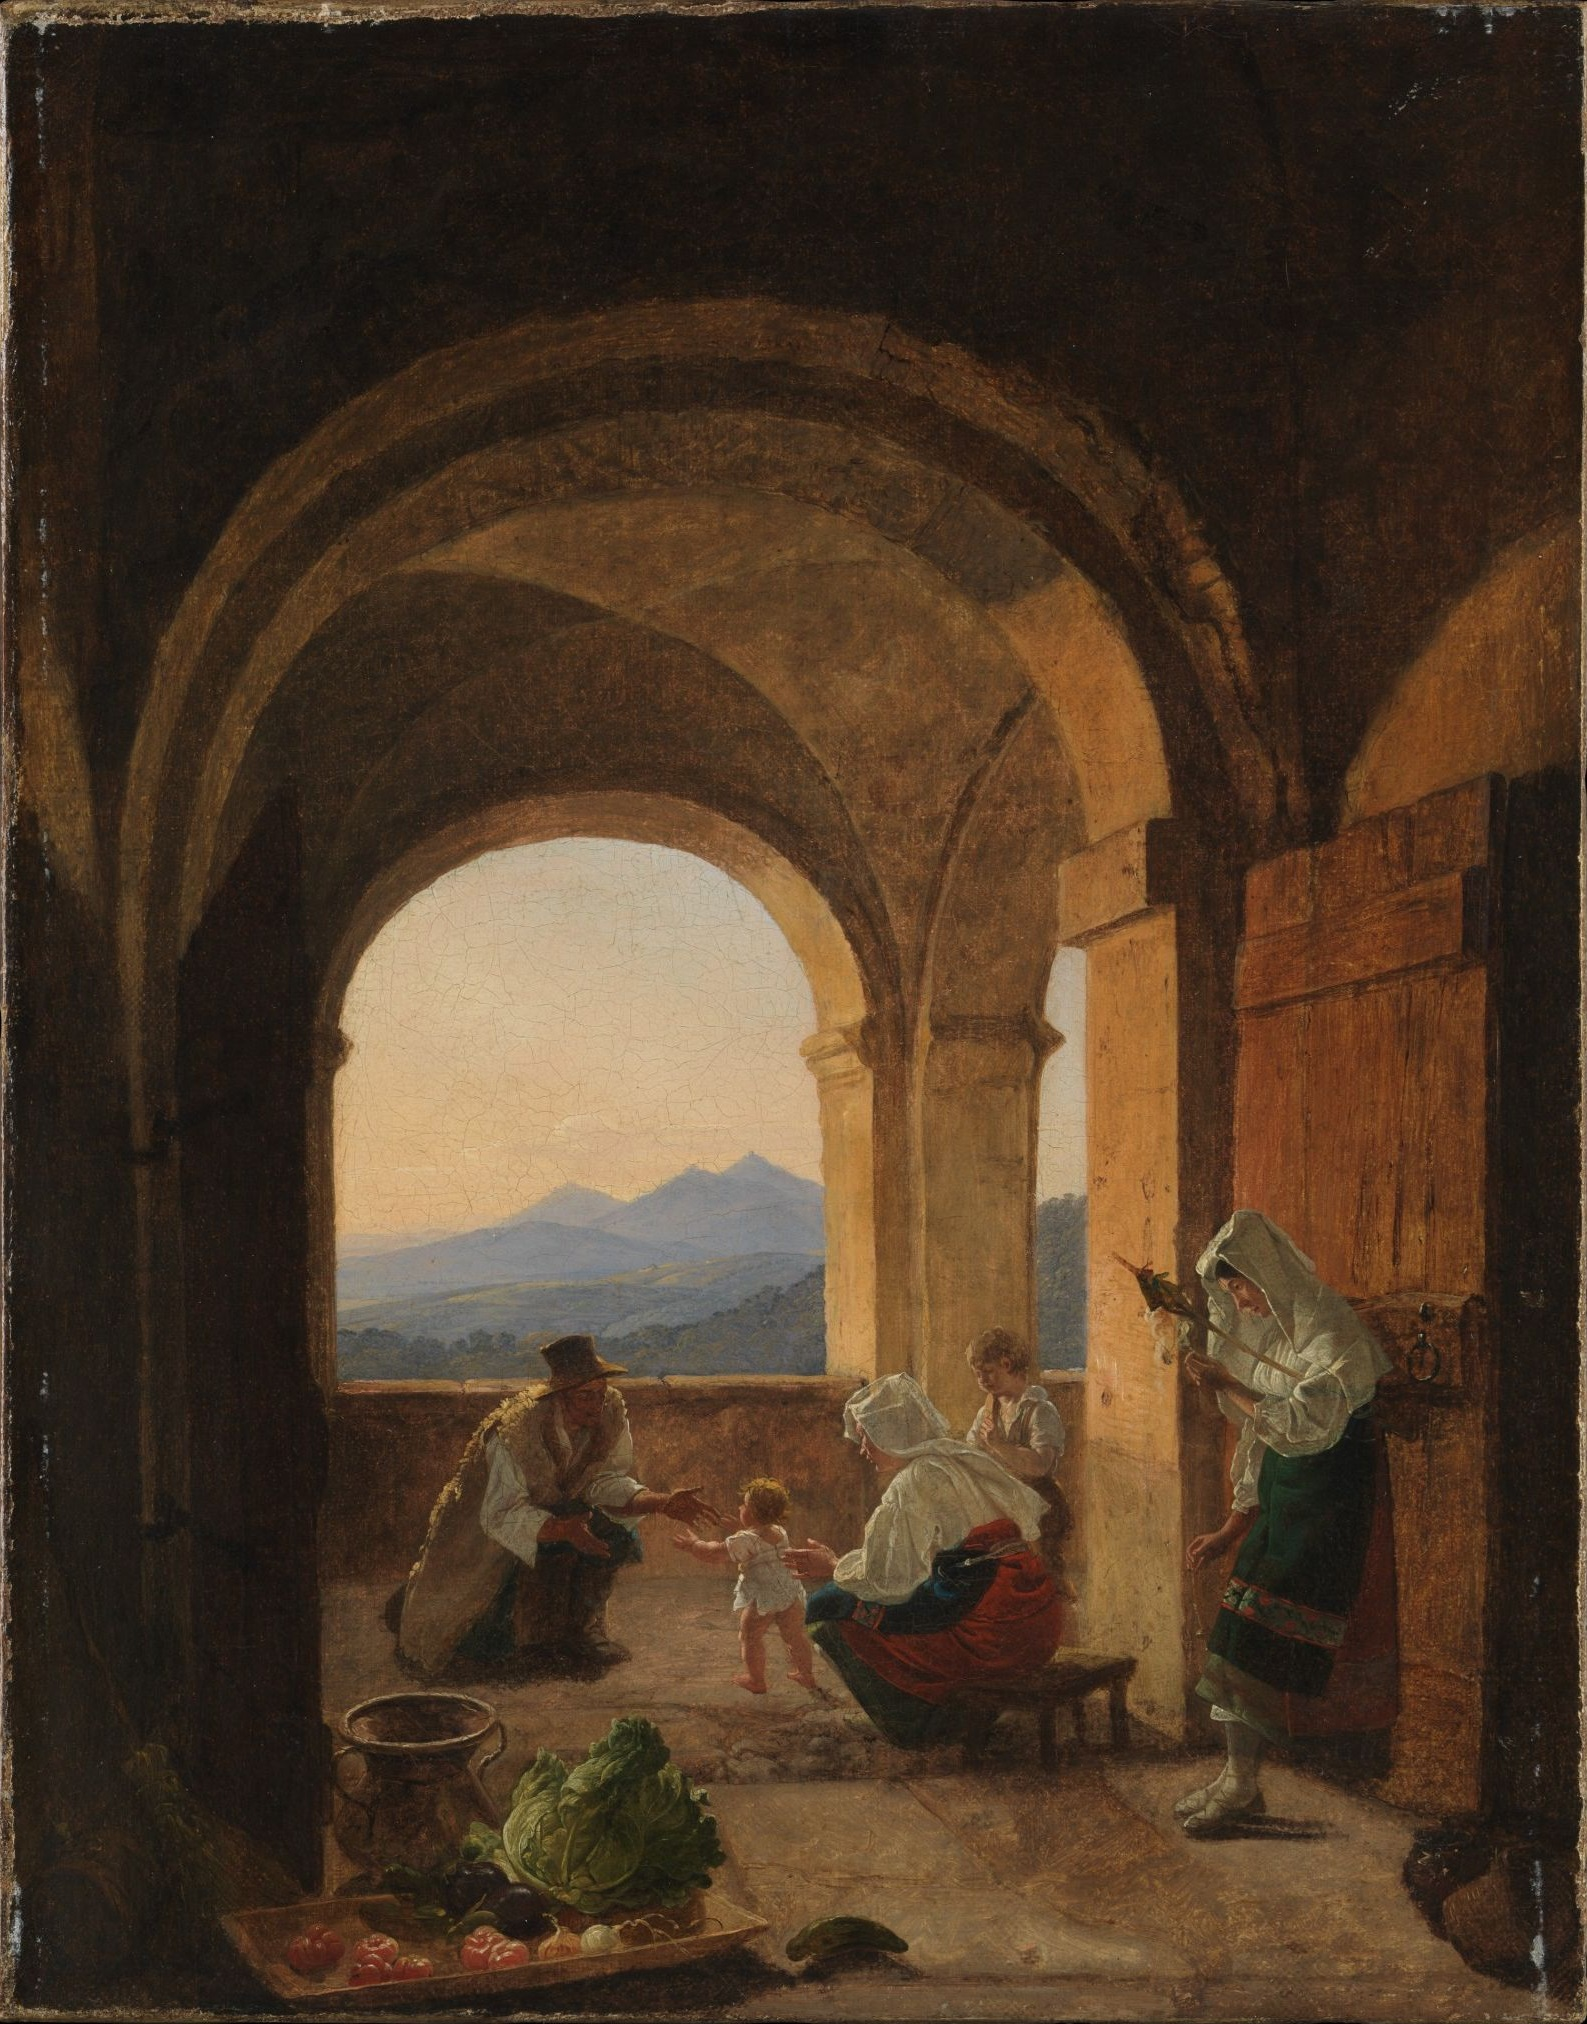 Franz_Ludwig_Catel_-_First_Steps_(1820s)